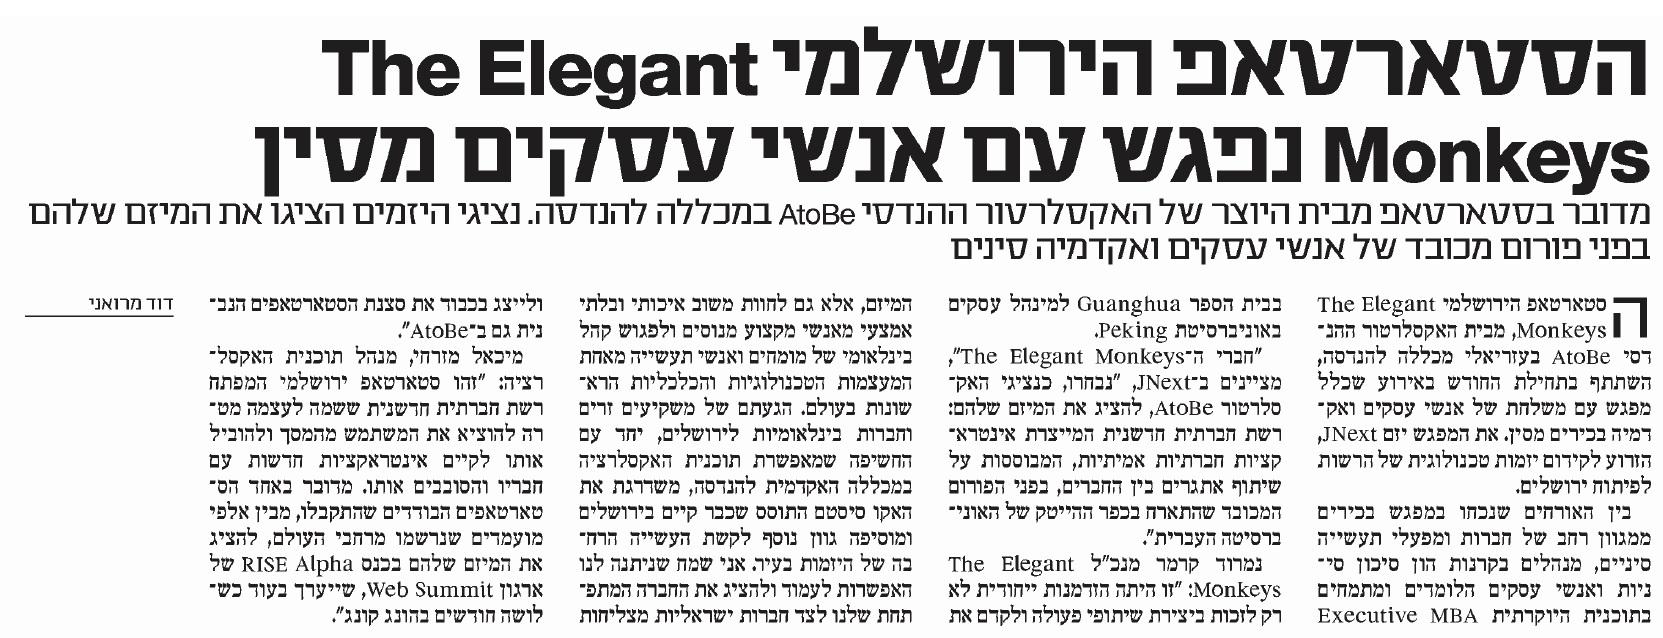 elegant monkeys- 22.4.15 כתבה שפורסמה בעיתון כל העיר